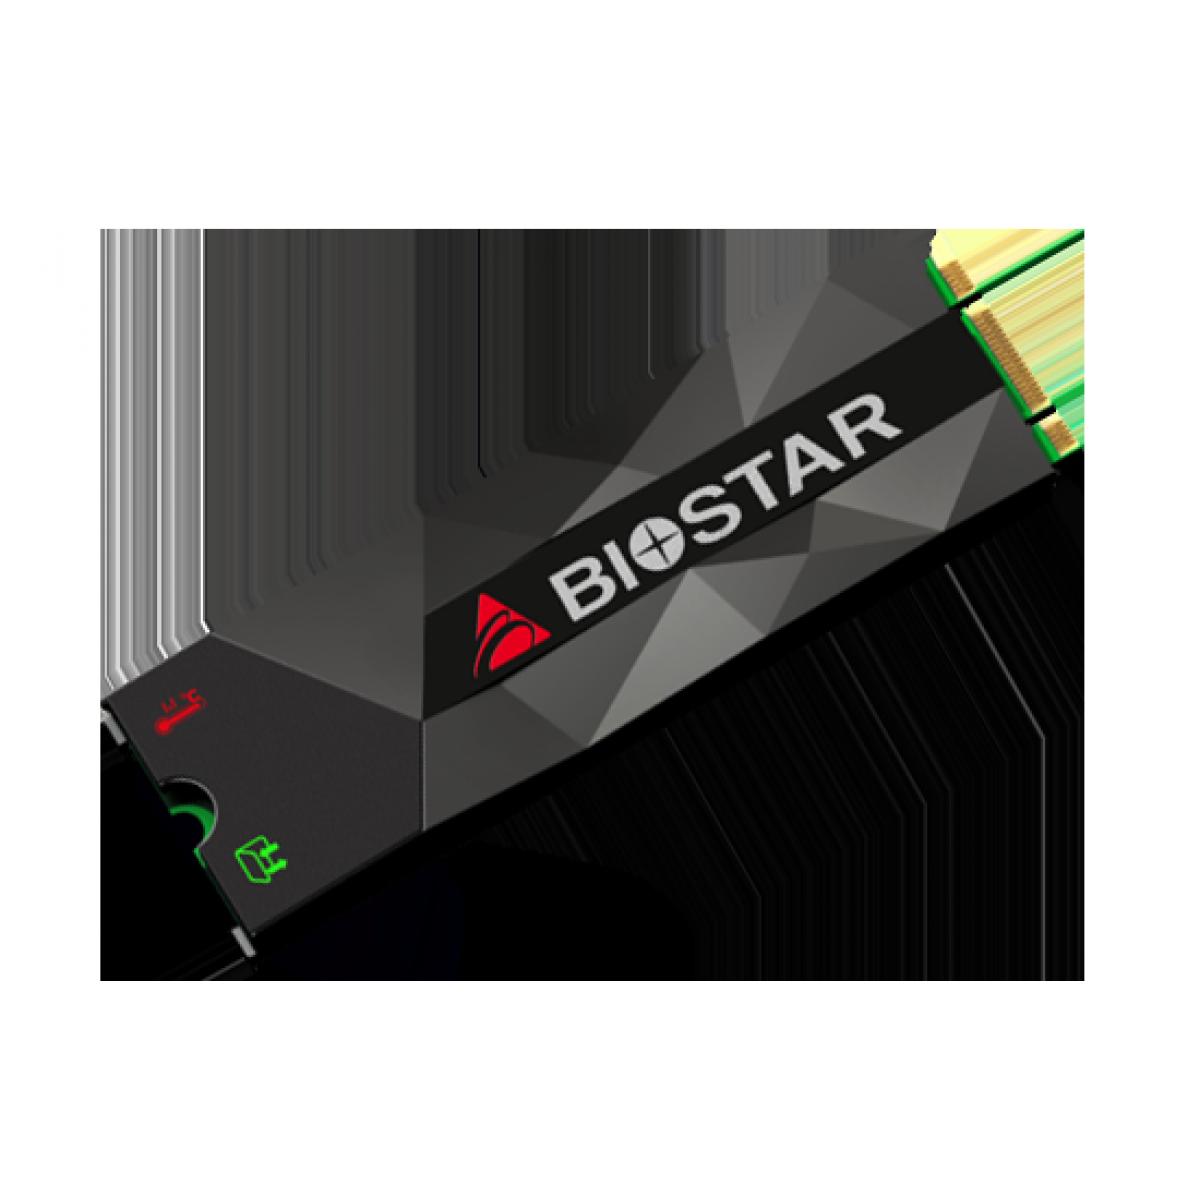 SSD Biostar P300, 256GB, NVME, Leitura 1600MBs e Gravação 900MBs, SE160PM236-YT1B8-BS2